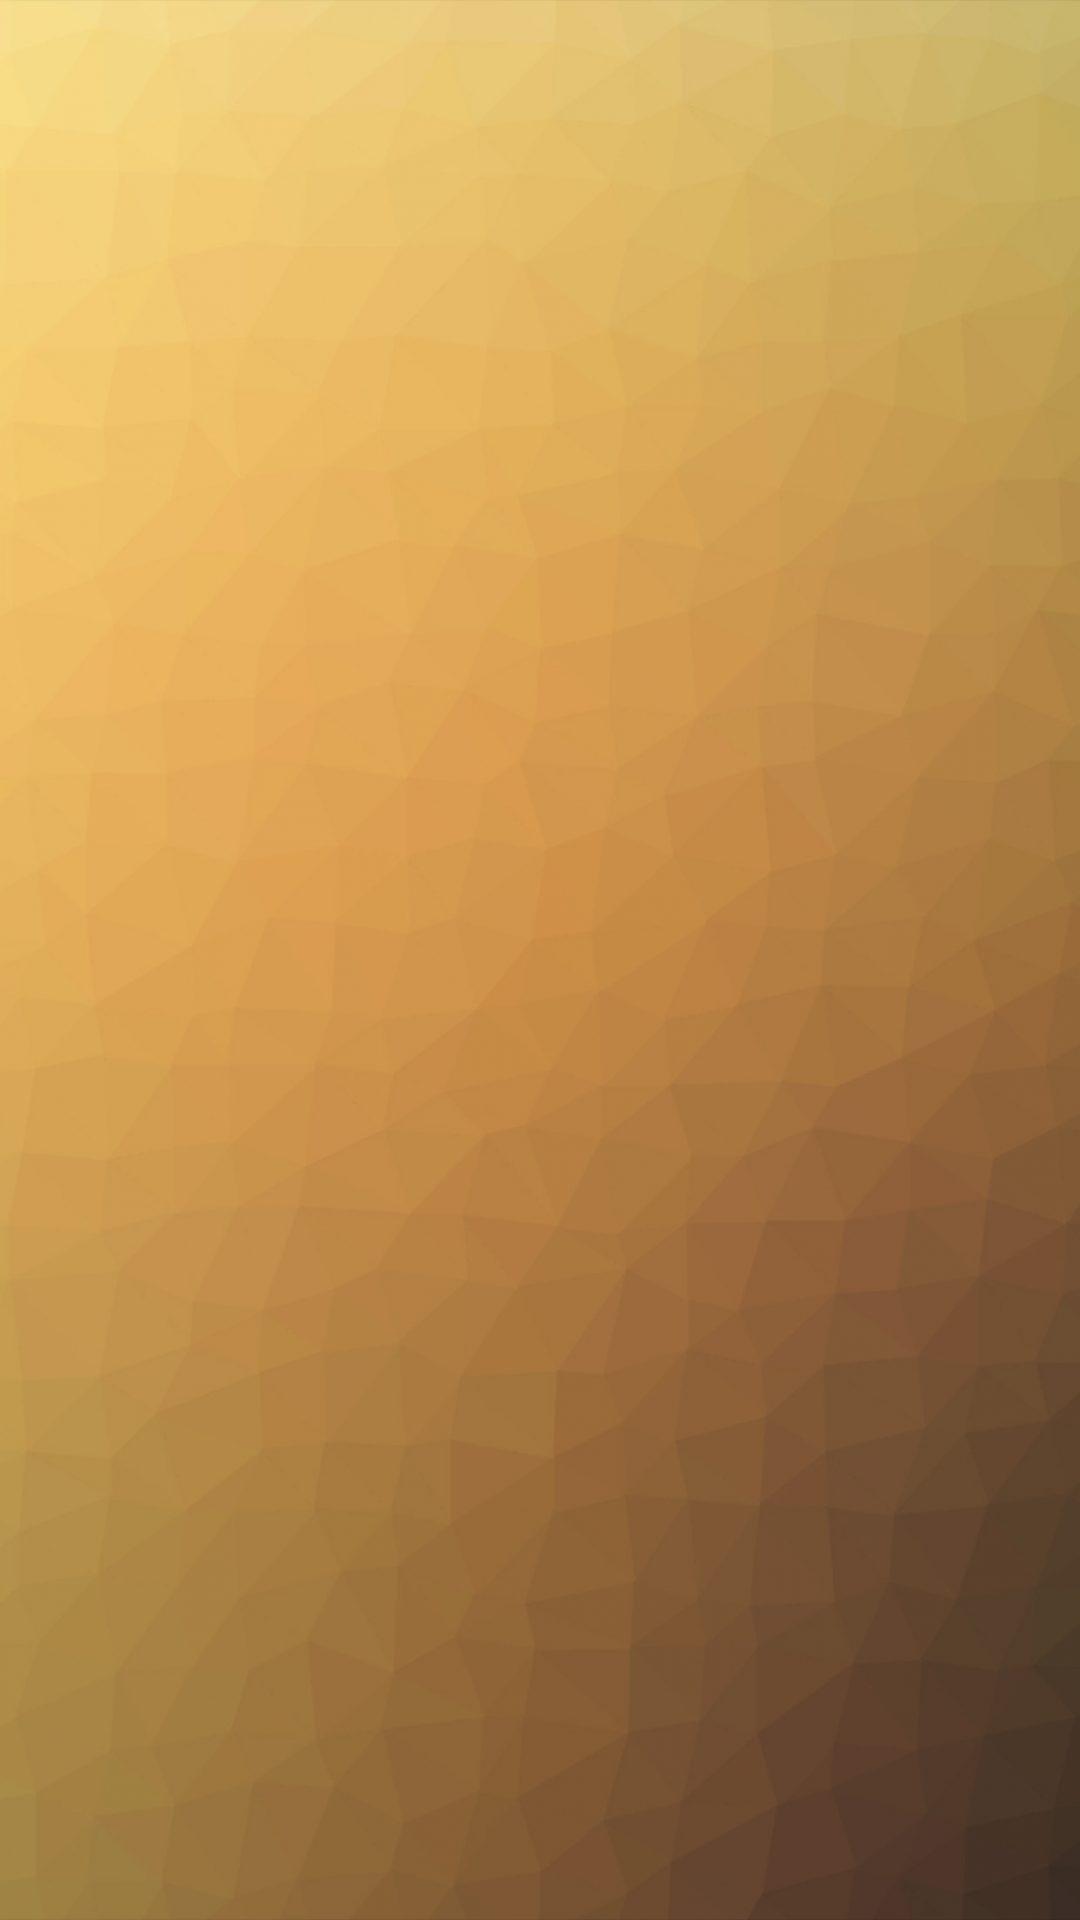 Polygon Art Yellow Abstract Pattern